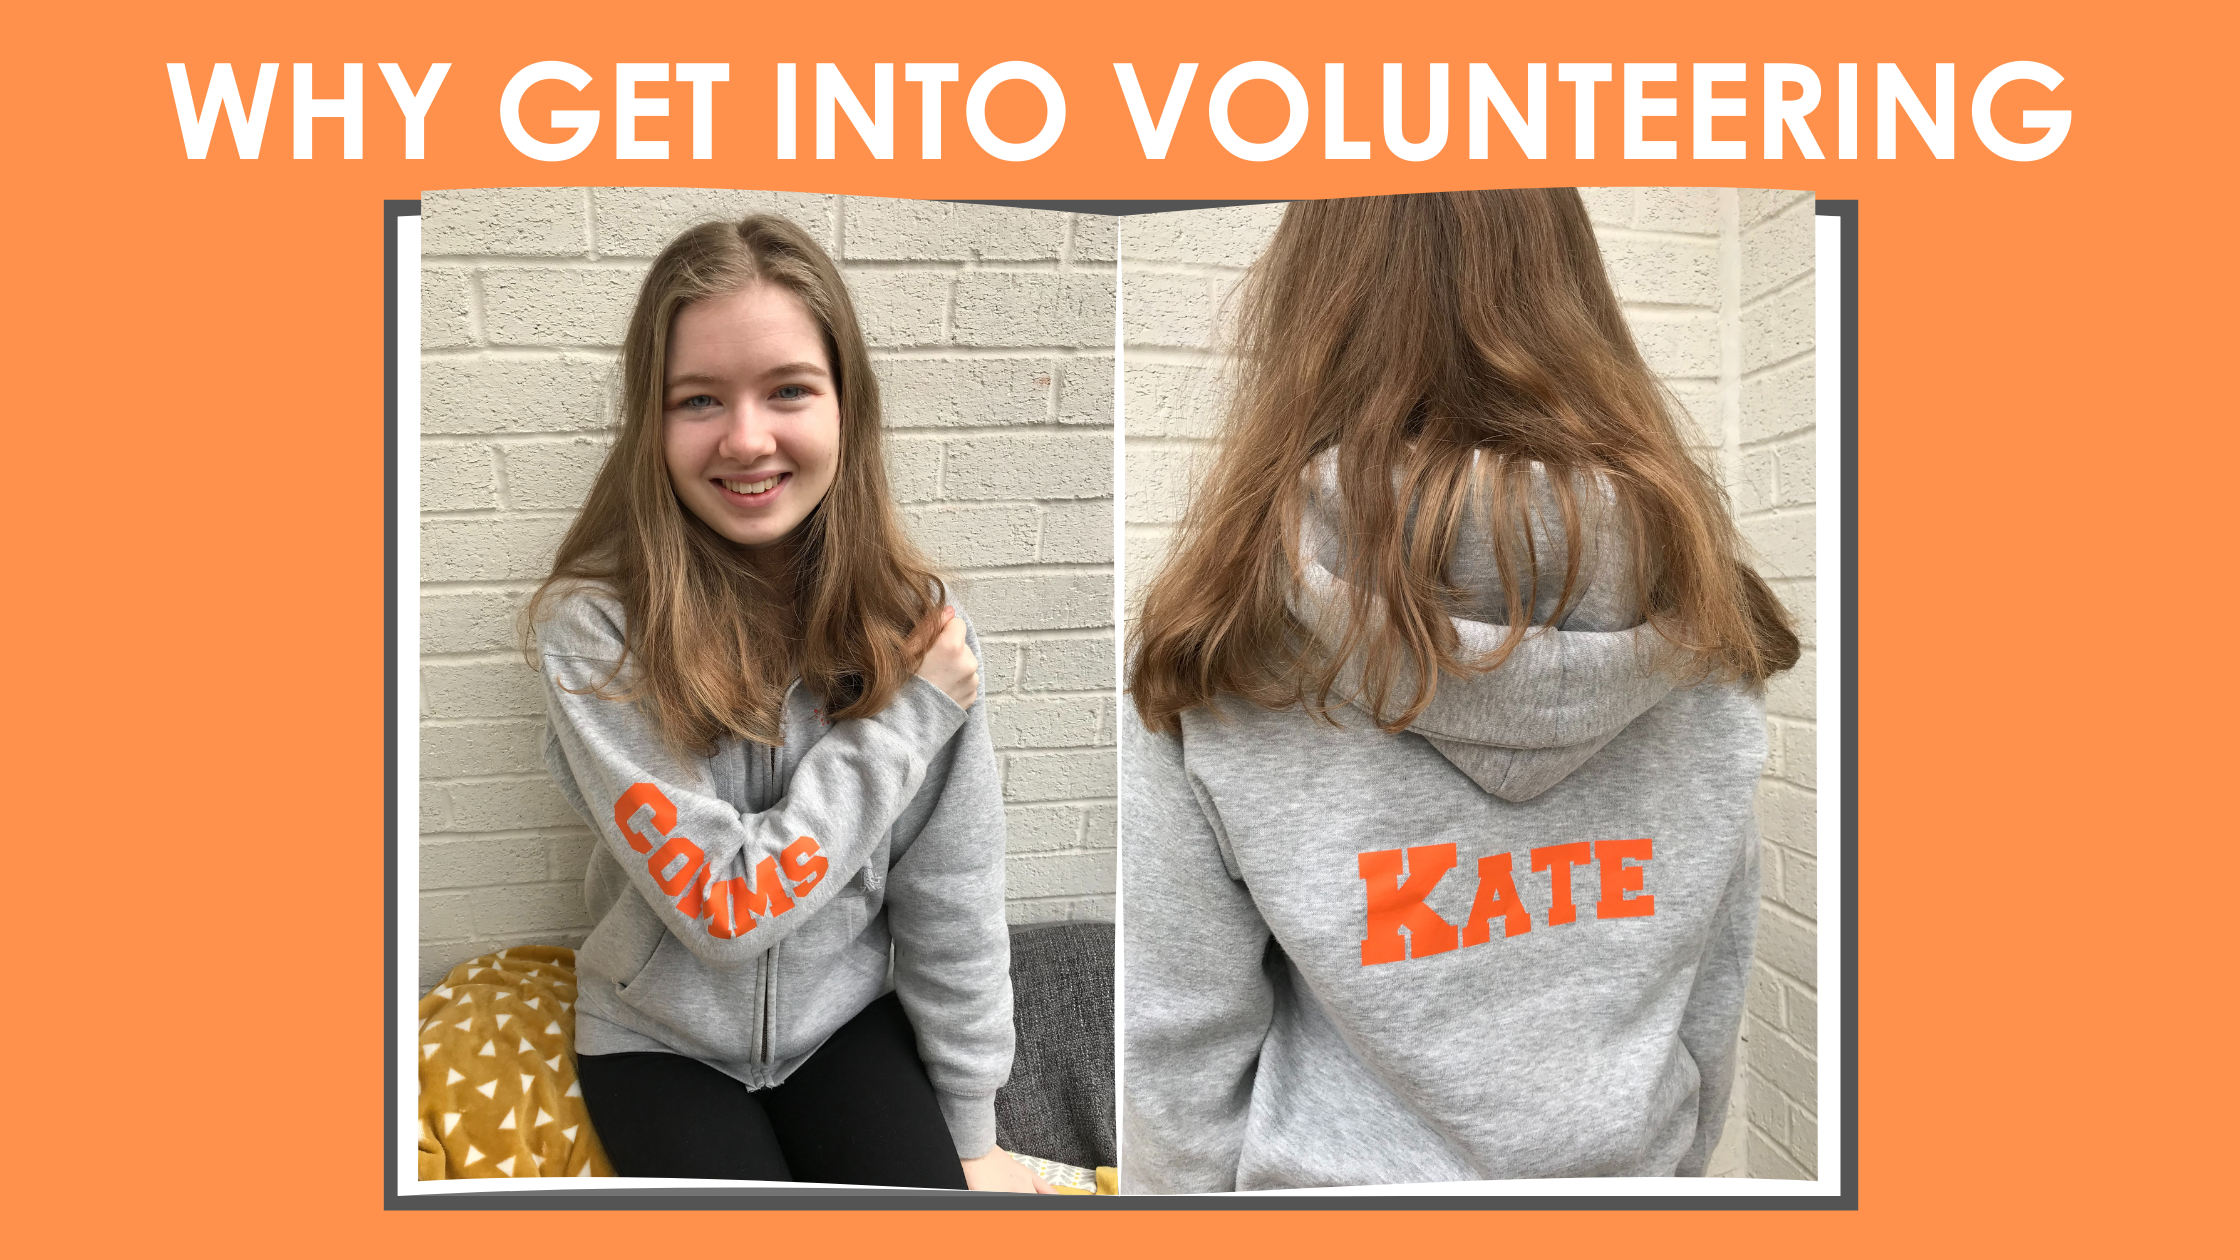 Why get into Volunteering?